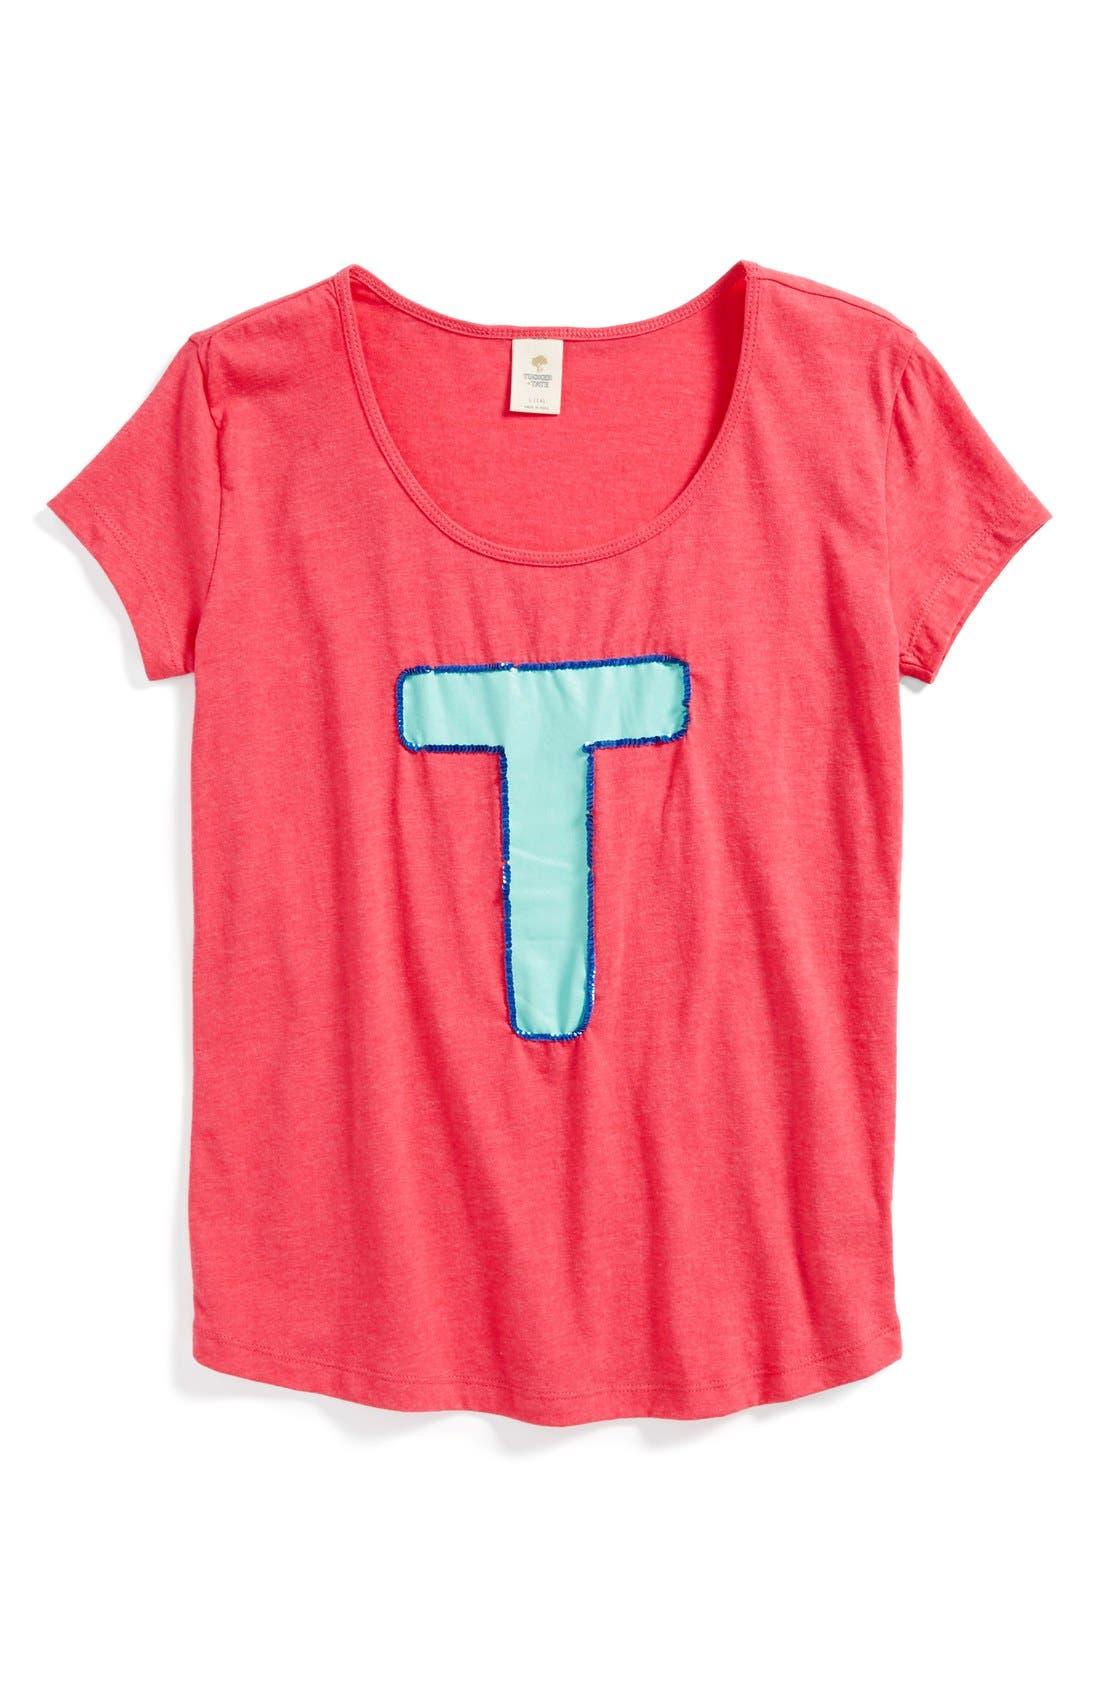 Alternate Image 1 Selected - Tucker + Tate 'Dockside' Graphic Tee (Big Girls)